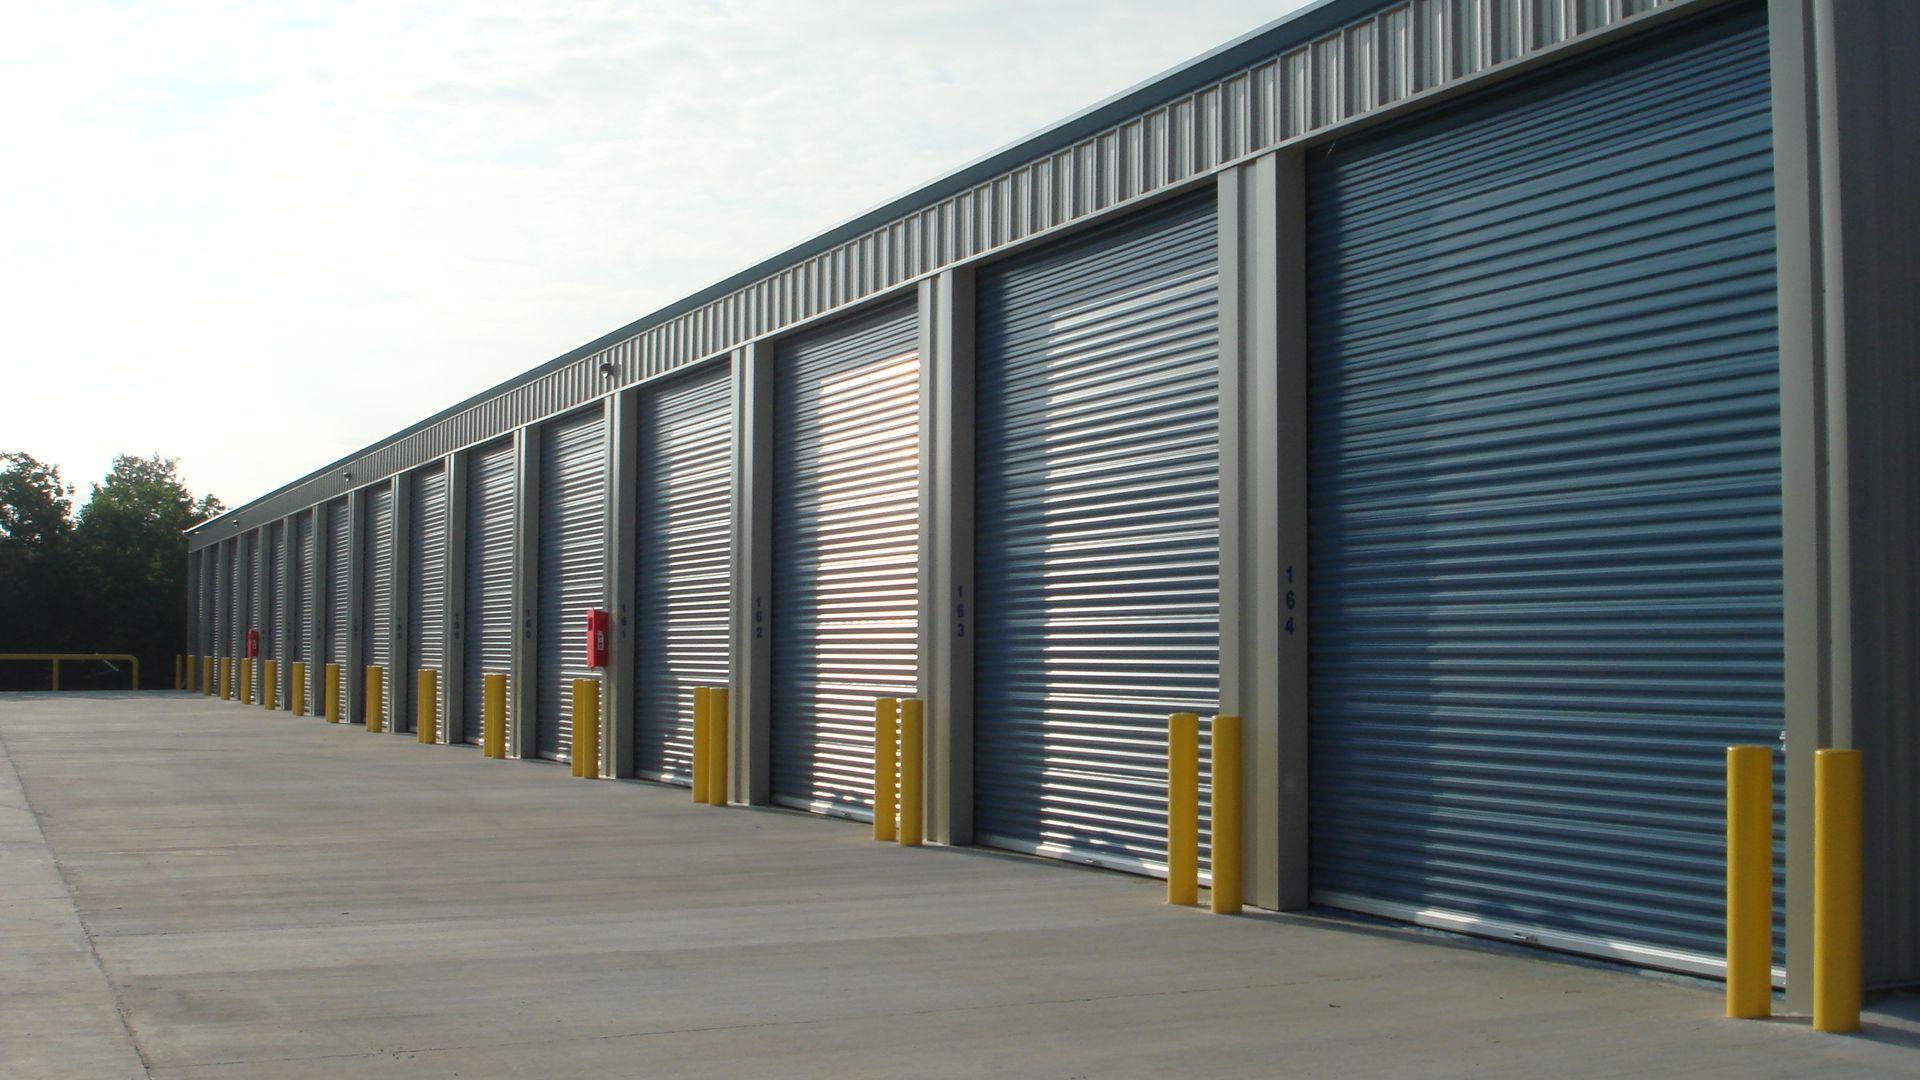 Selfstoragecasagrande Business Provides A Several Kinds Of Storage Units Of Sizes To Commercial And Residential T Self Storage Self Storage Units Storage Unit